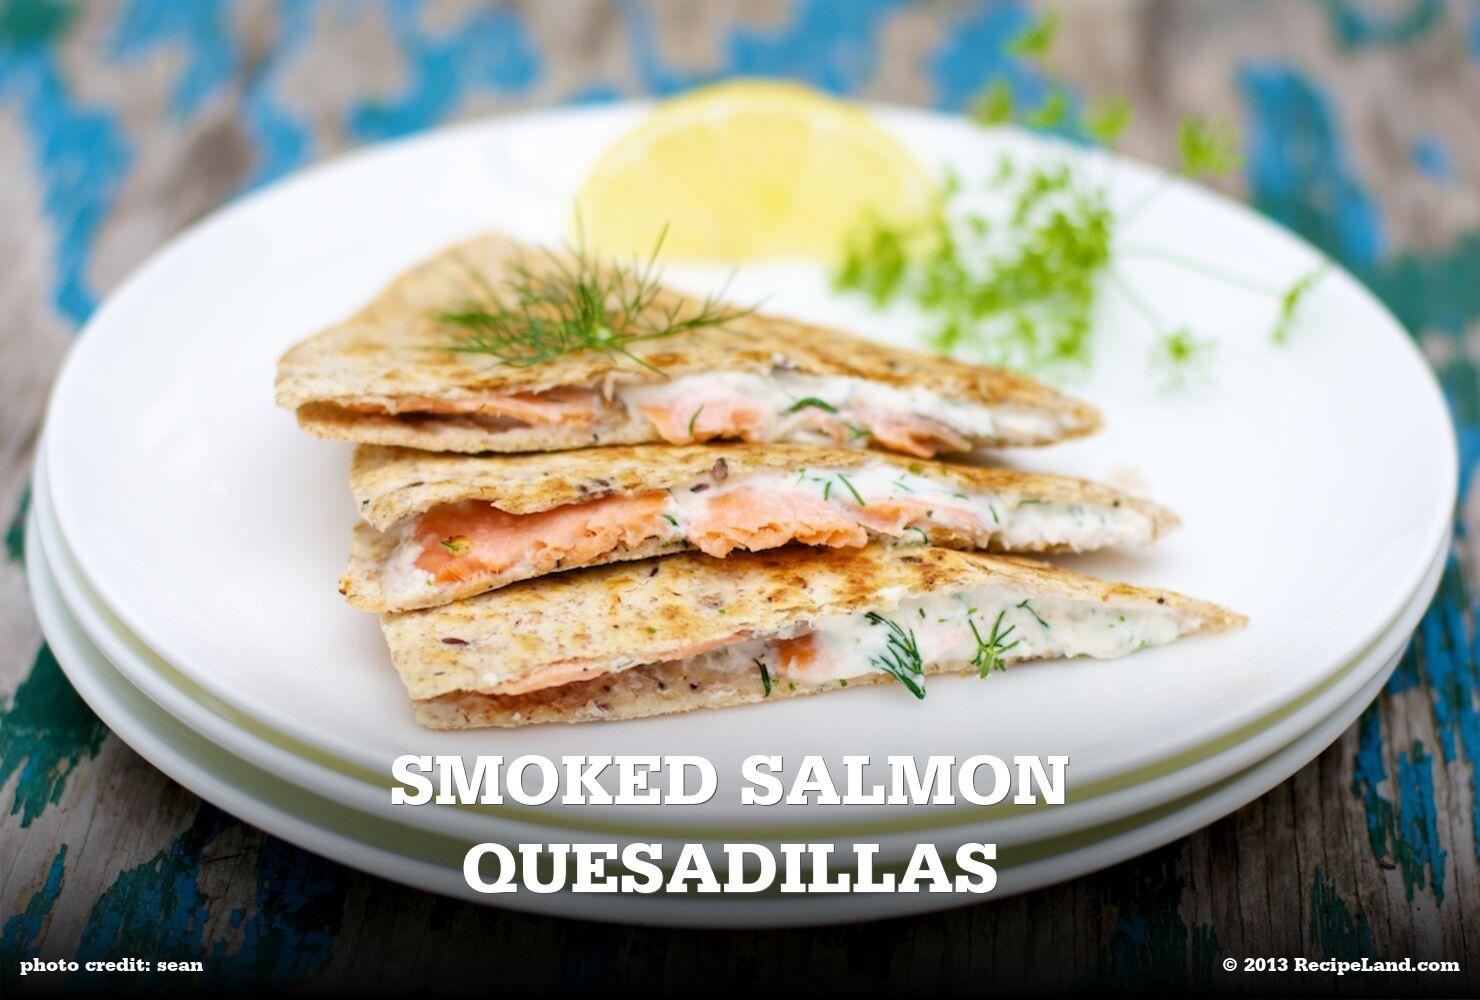 Smoked Salmon Quesadillas